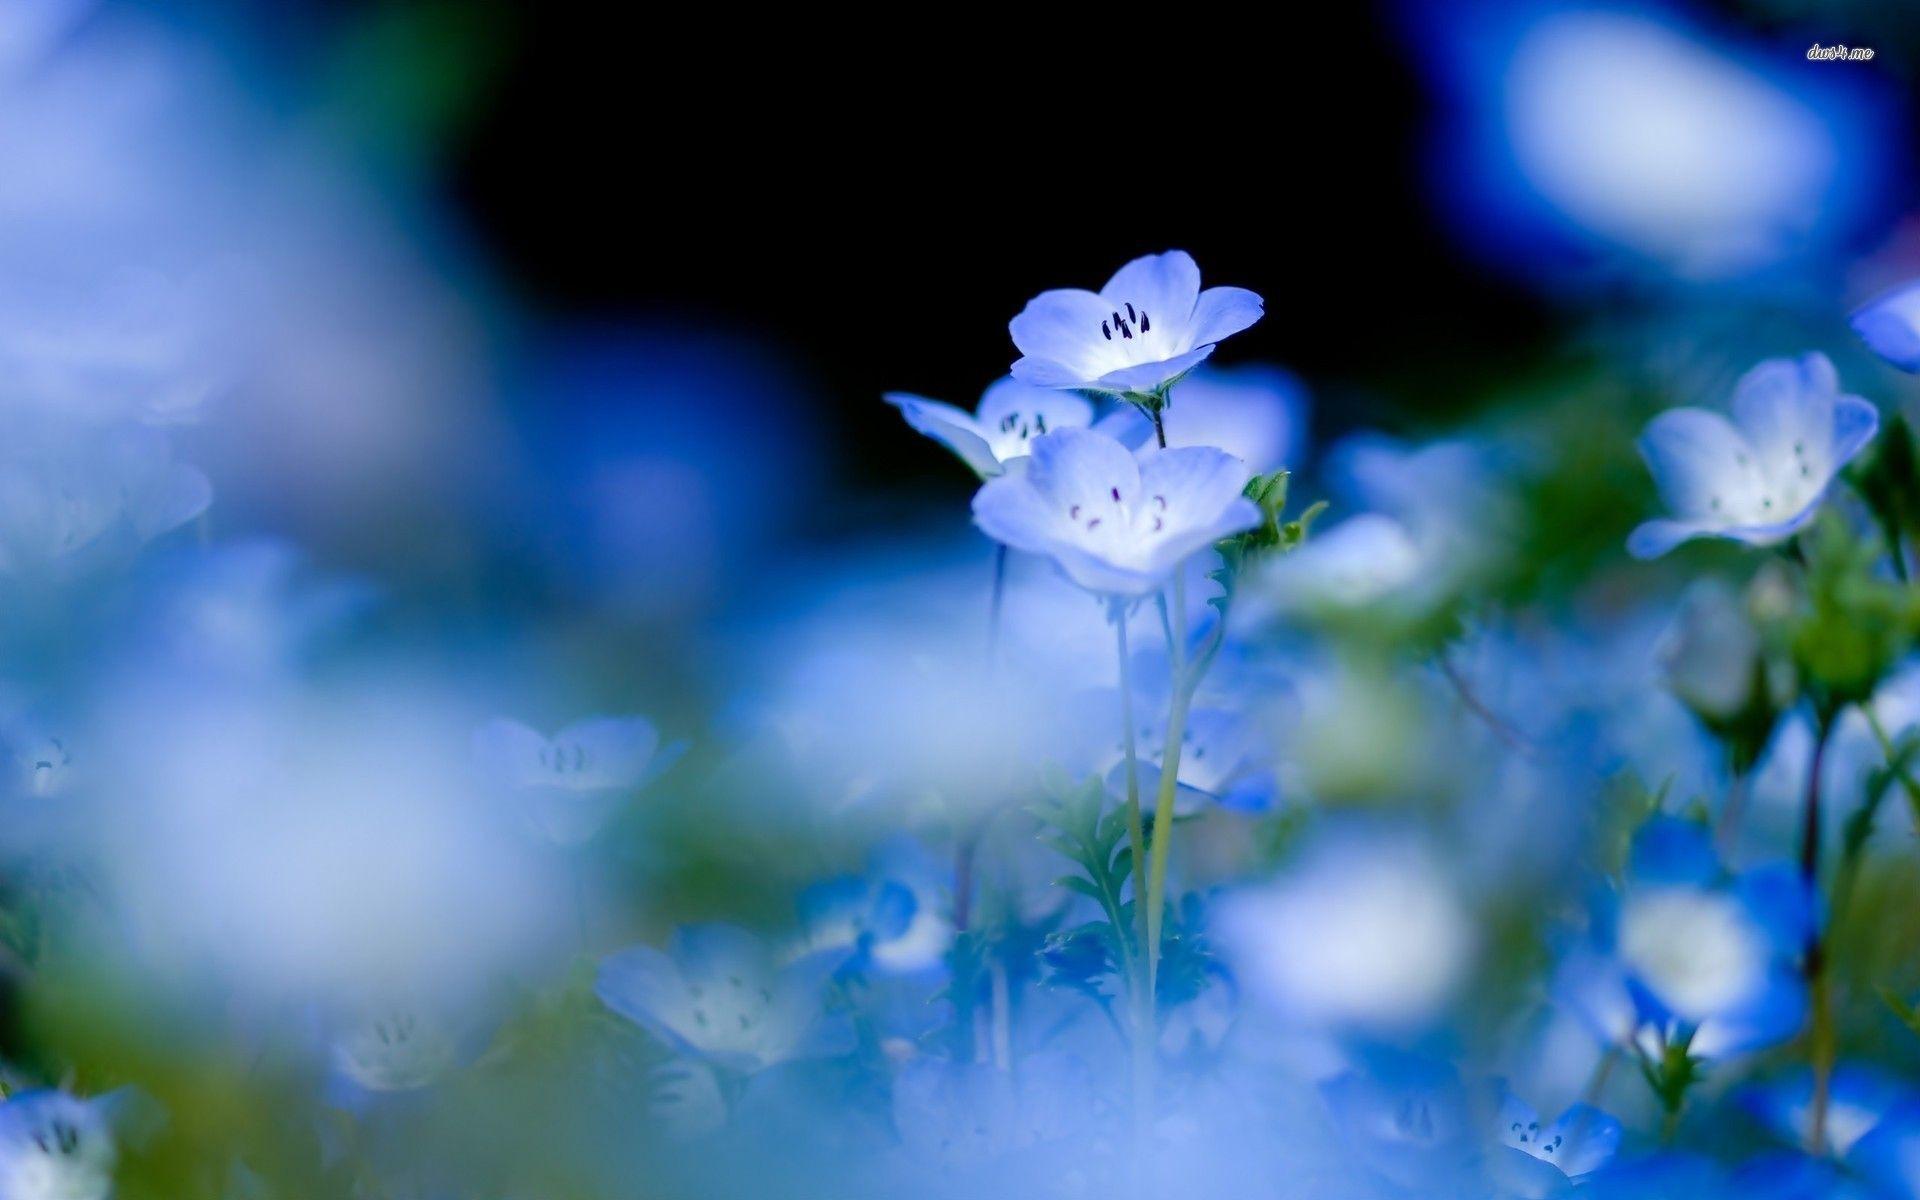 Small blue flowers flower wallpaper flowers pinterest flower small blue flowers flower wallpaper izmirmasajfo